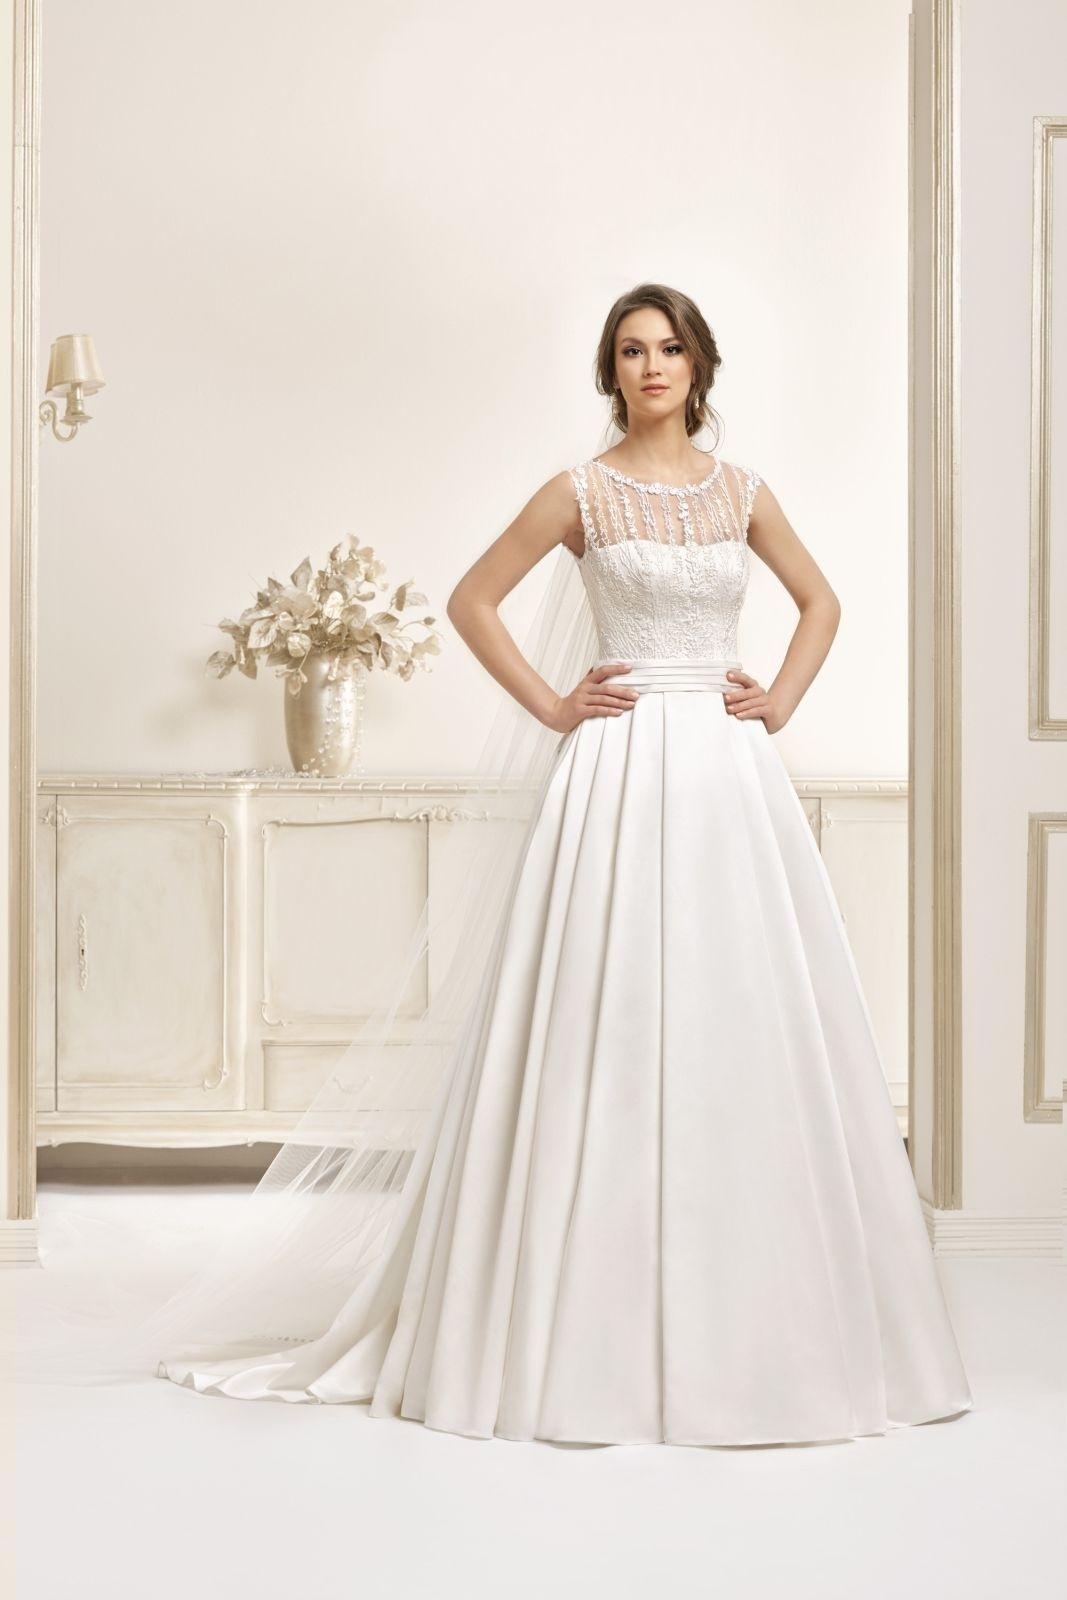 Formal Großartig Brautkleider Mode GalerieFormal Luxurius Brautkleider Mode Spezialgebiet